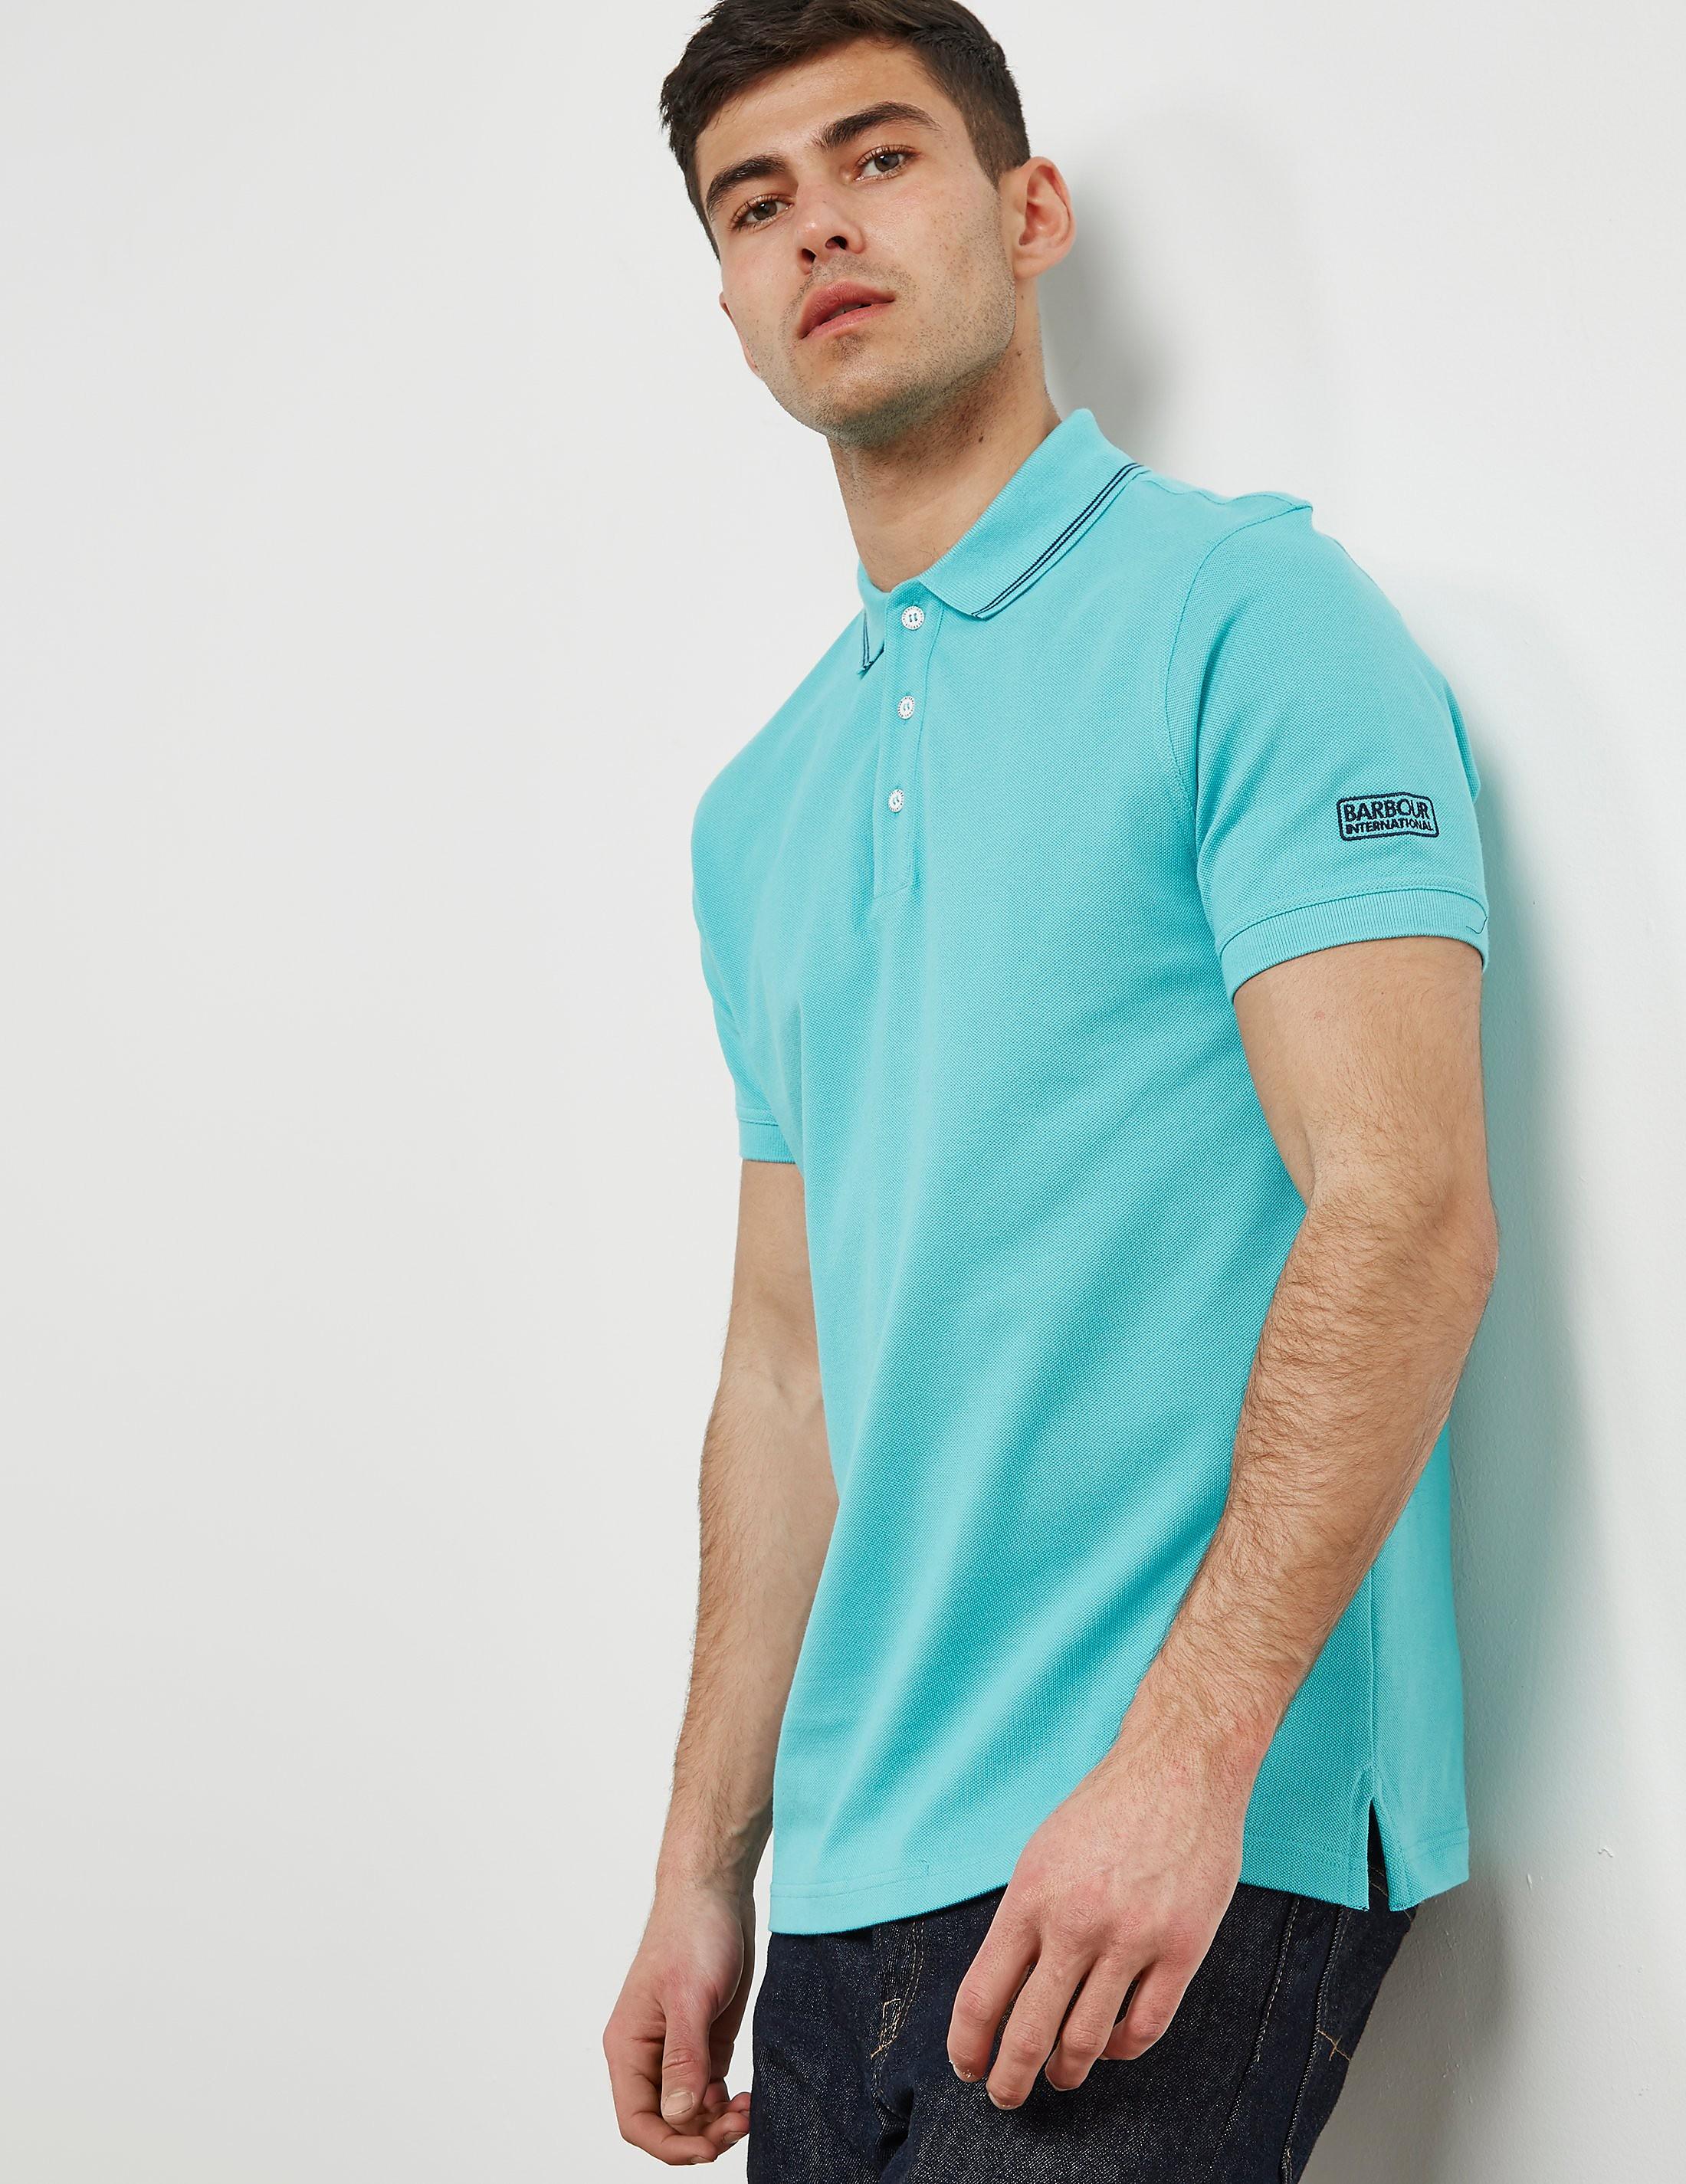 Barbour International Tipped Short Sleeve Pique Polo Shirt